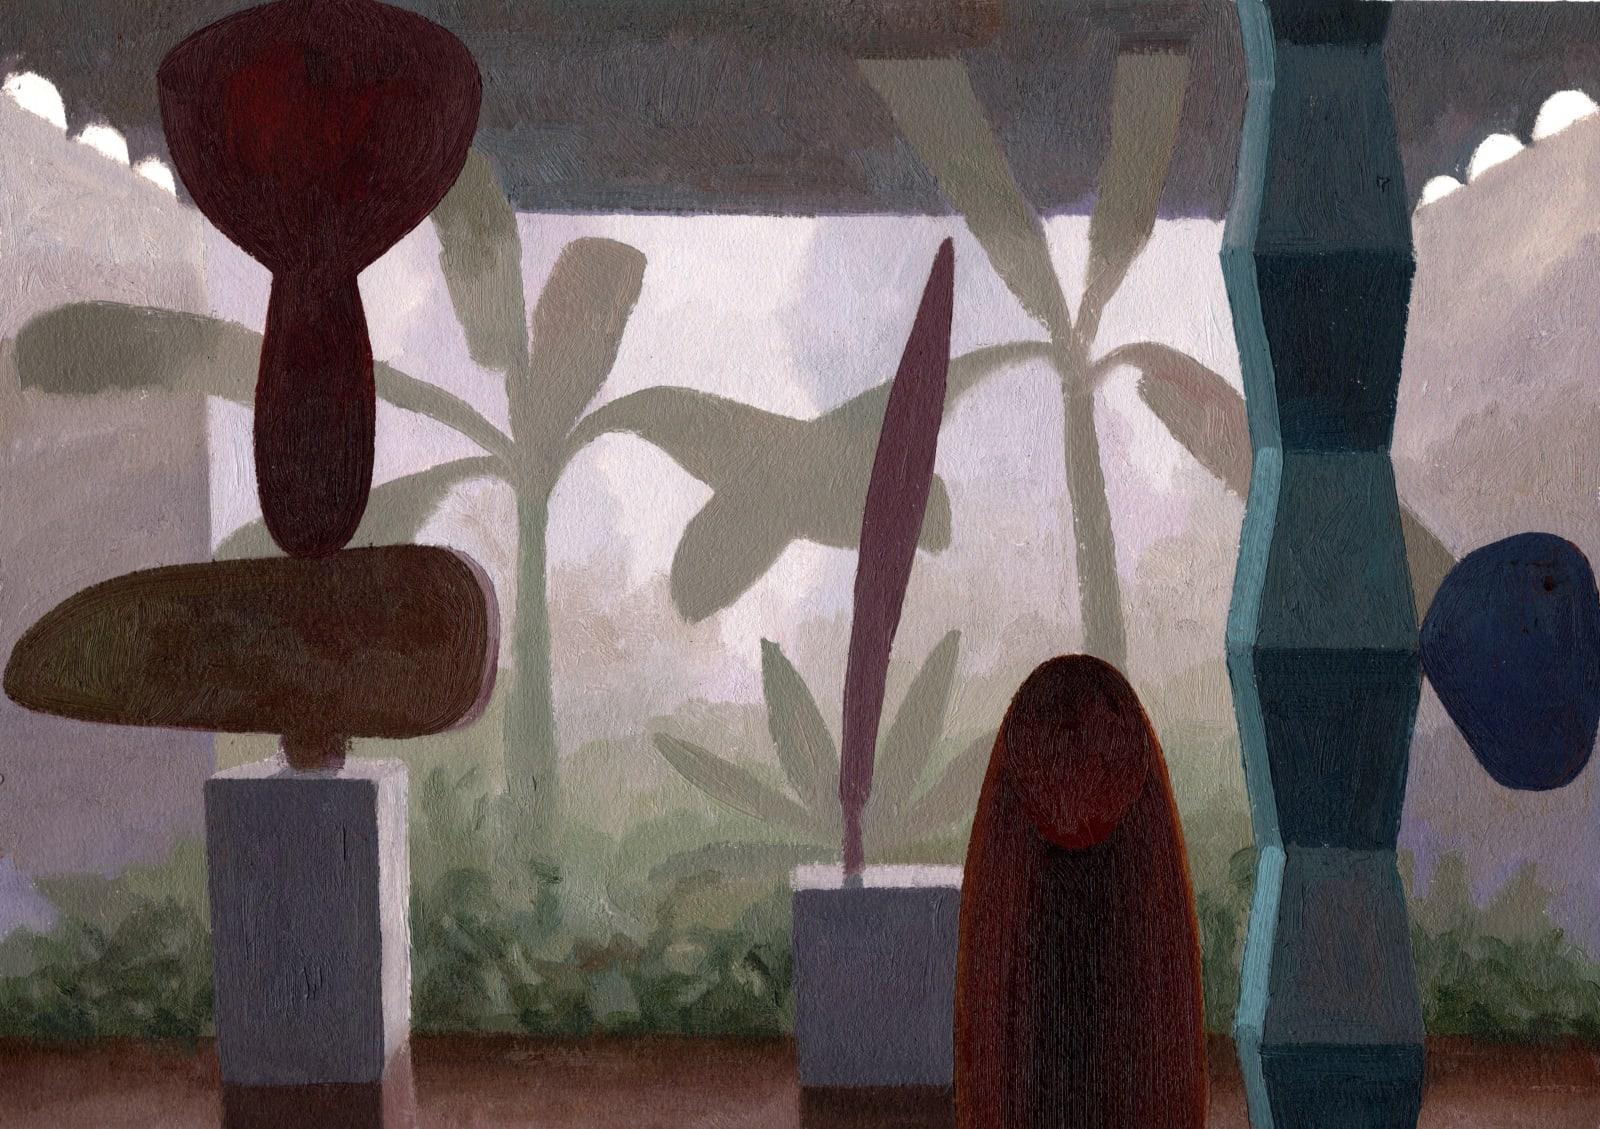 Daniel Dove Atrium #4 (Study), 2020 Oil on paper, unframed 12 1/4 x 16 1/8 in 31.1 x 41 cm